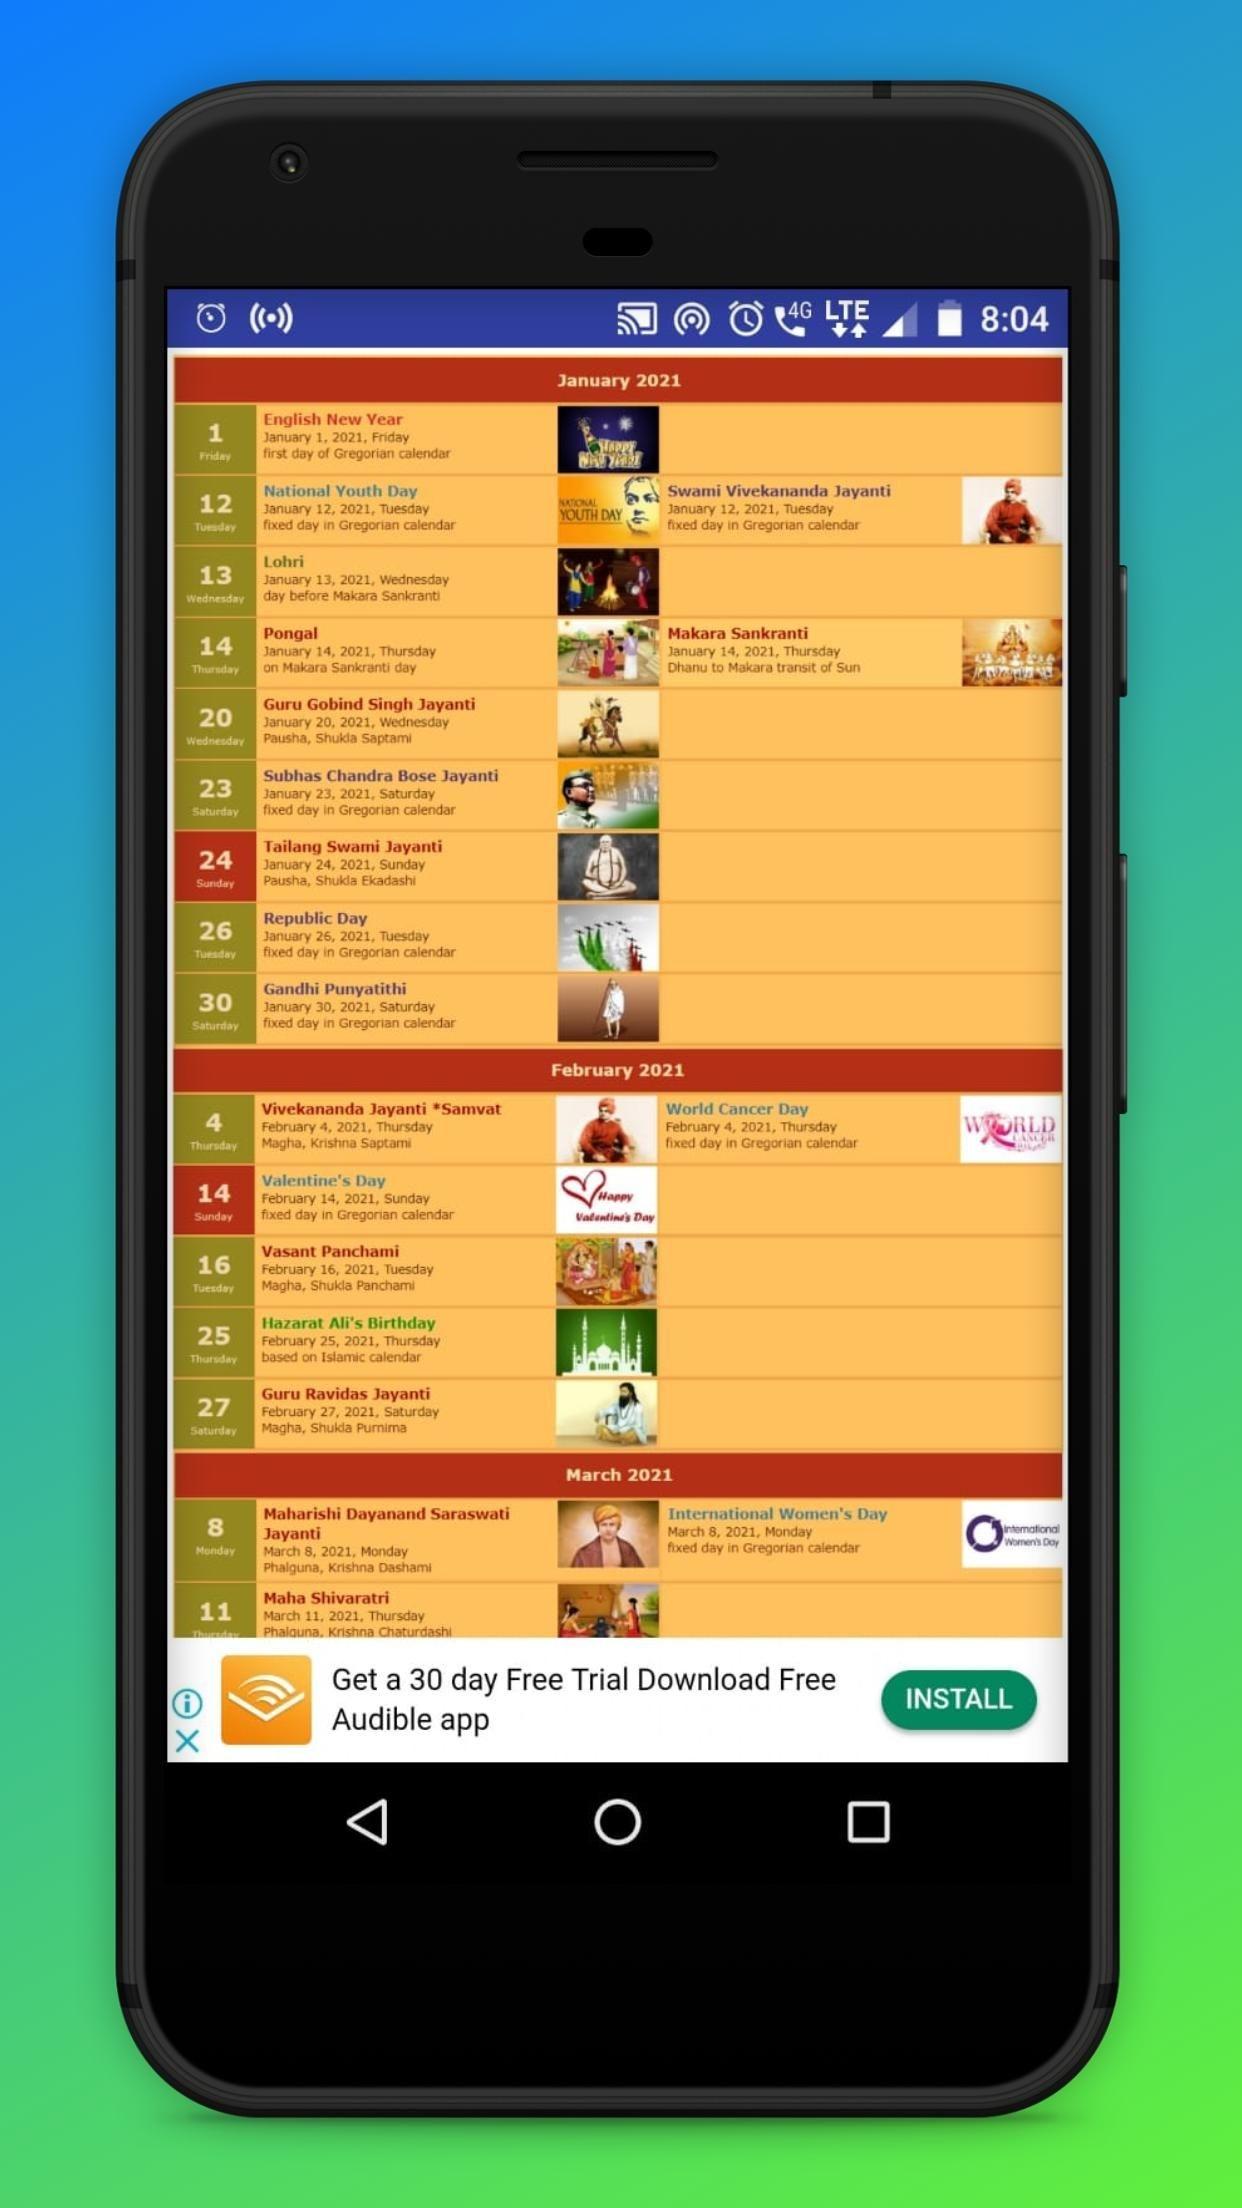 2021 Calendar Hindi Calendar 2021 With Festival For